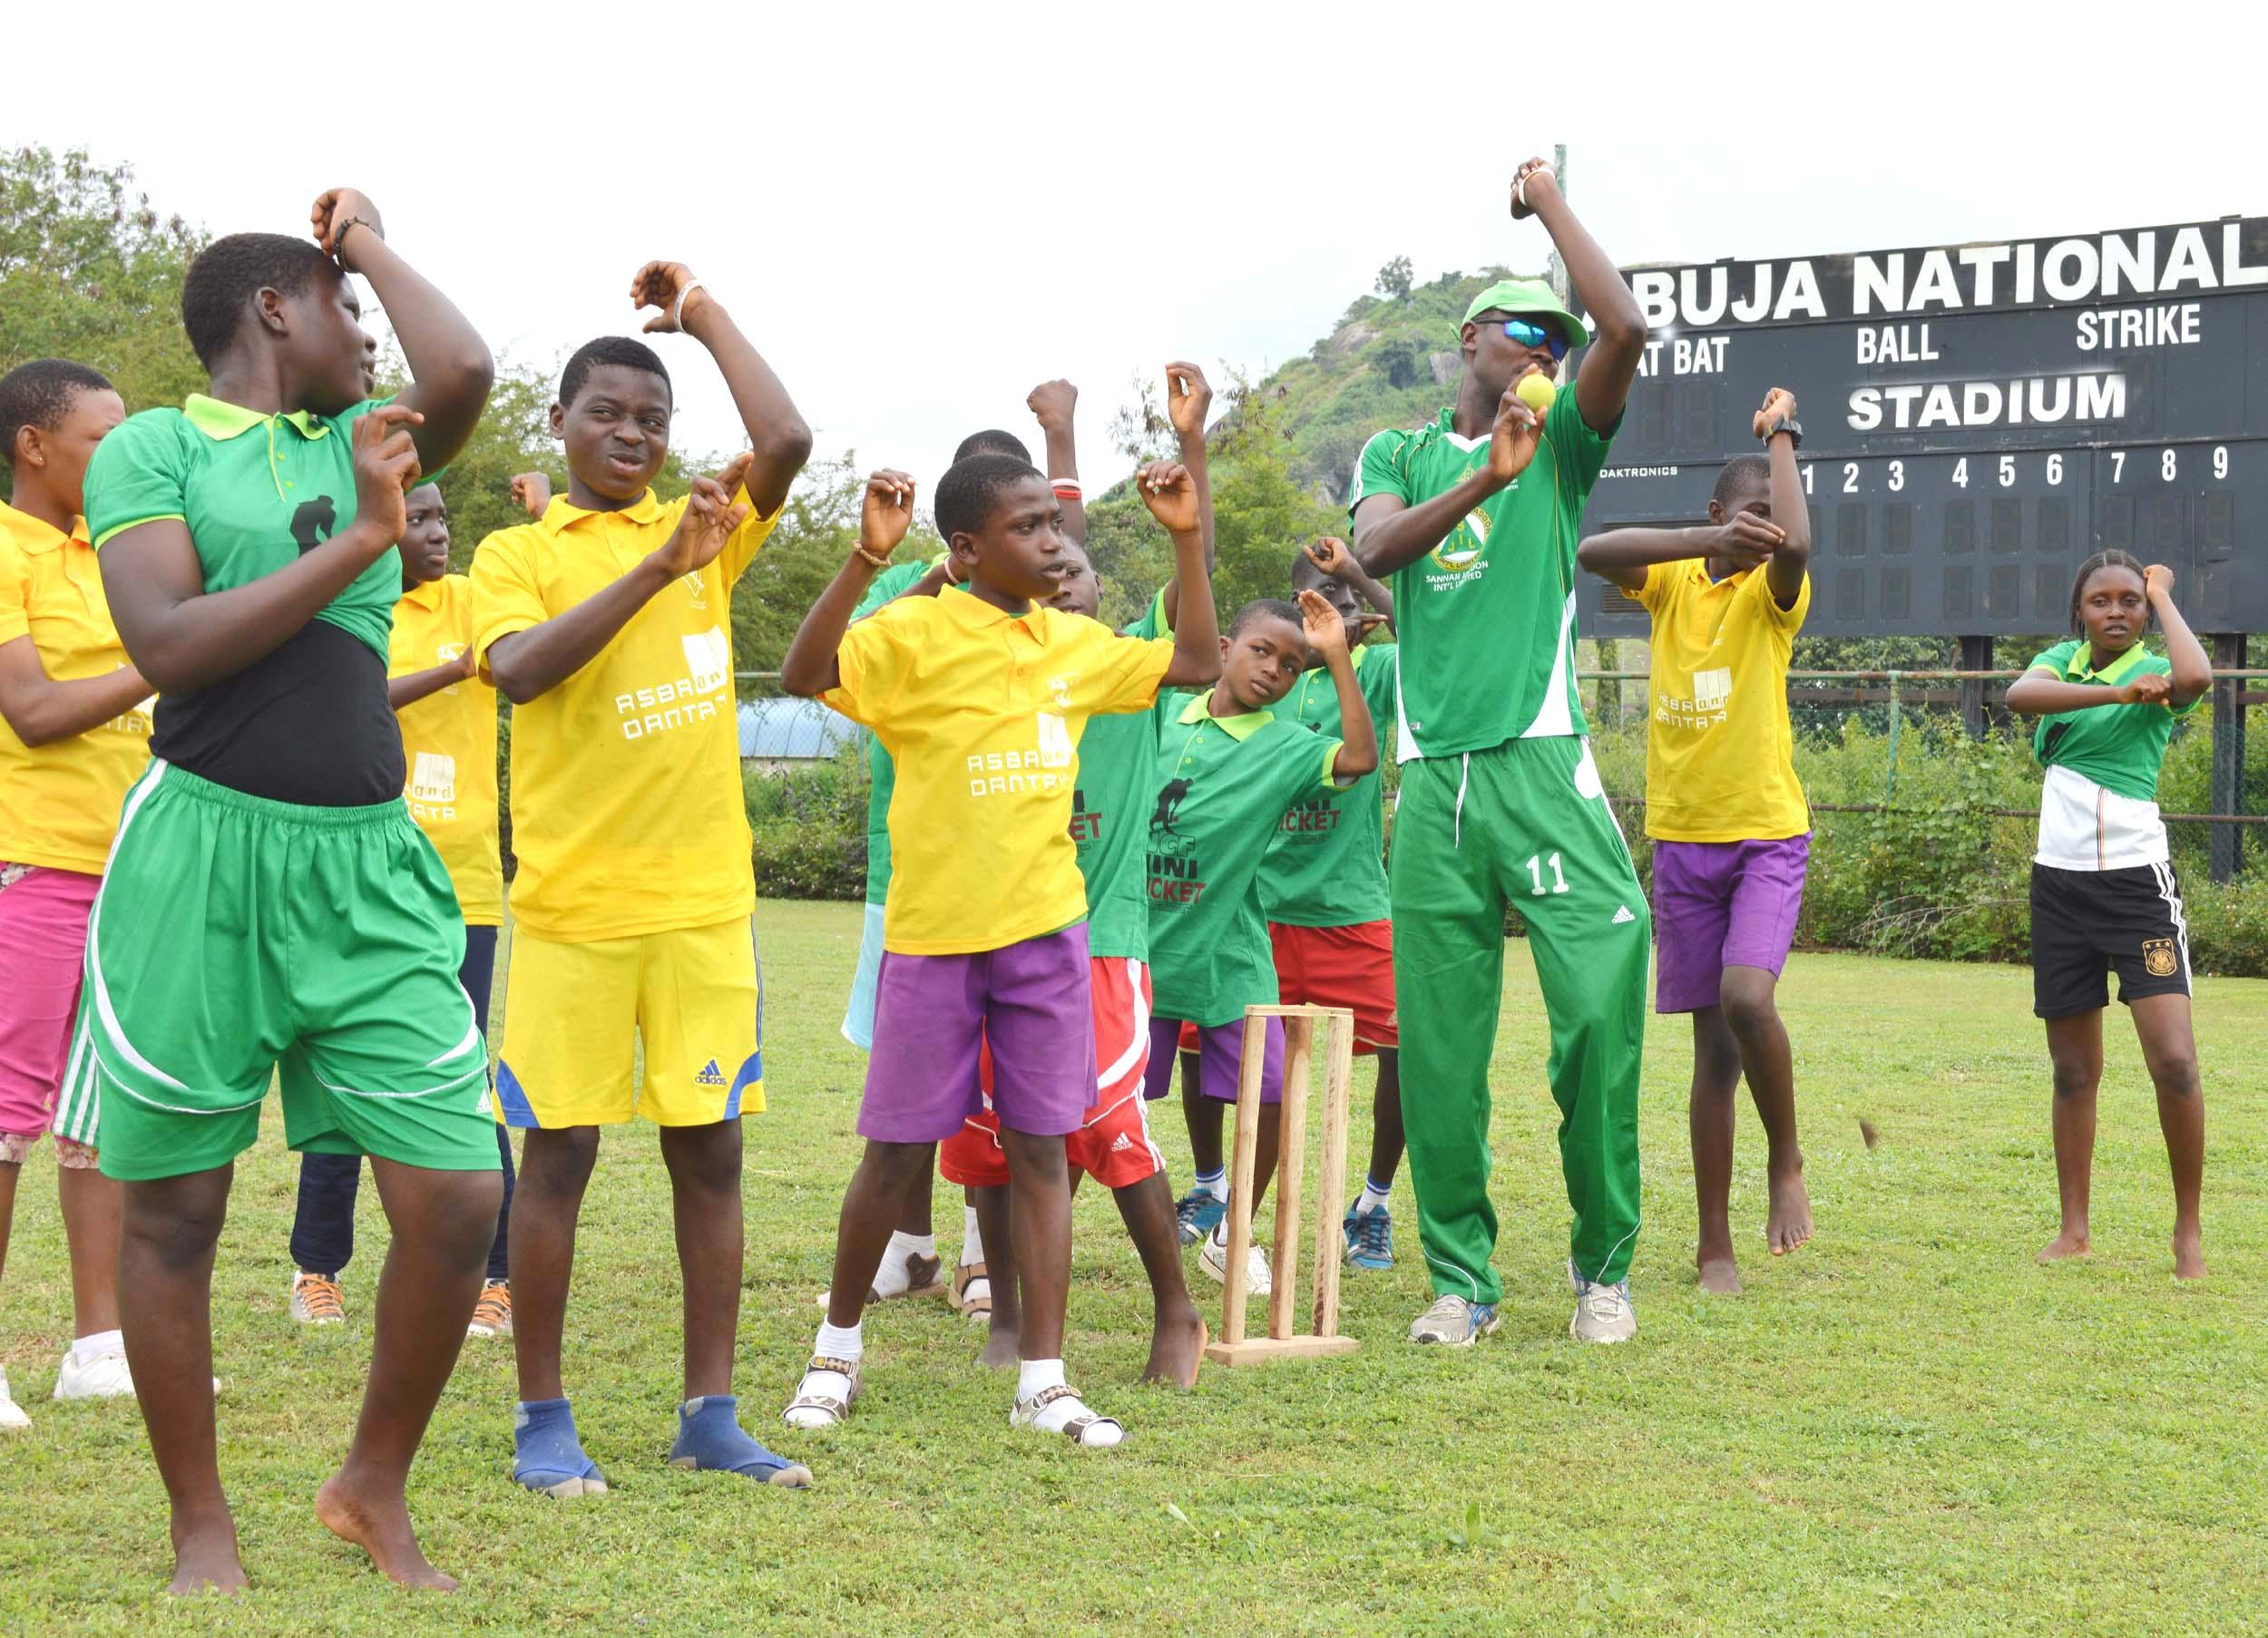 NCF satisfied with grassroots development- Emeka Onyeama